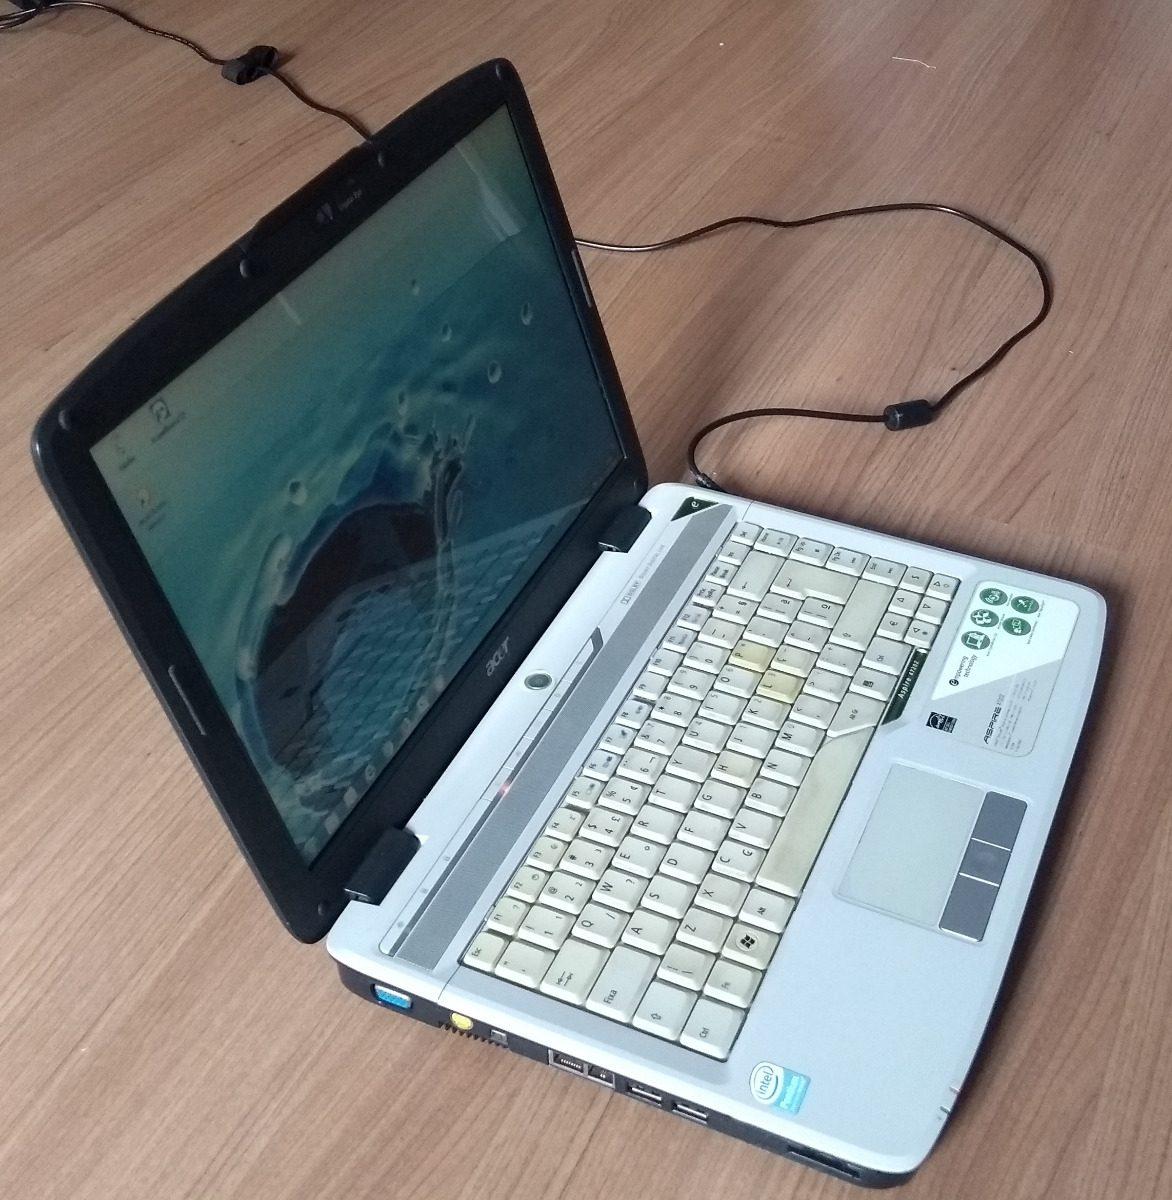 ACER ASPIRE 4720ZG VGA WINDOWS XP DRIVER DOWNLOAD